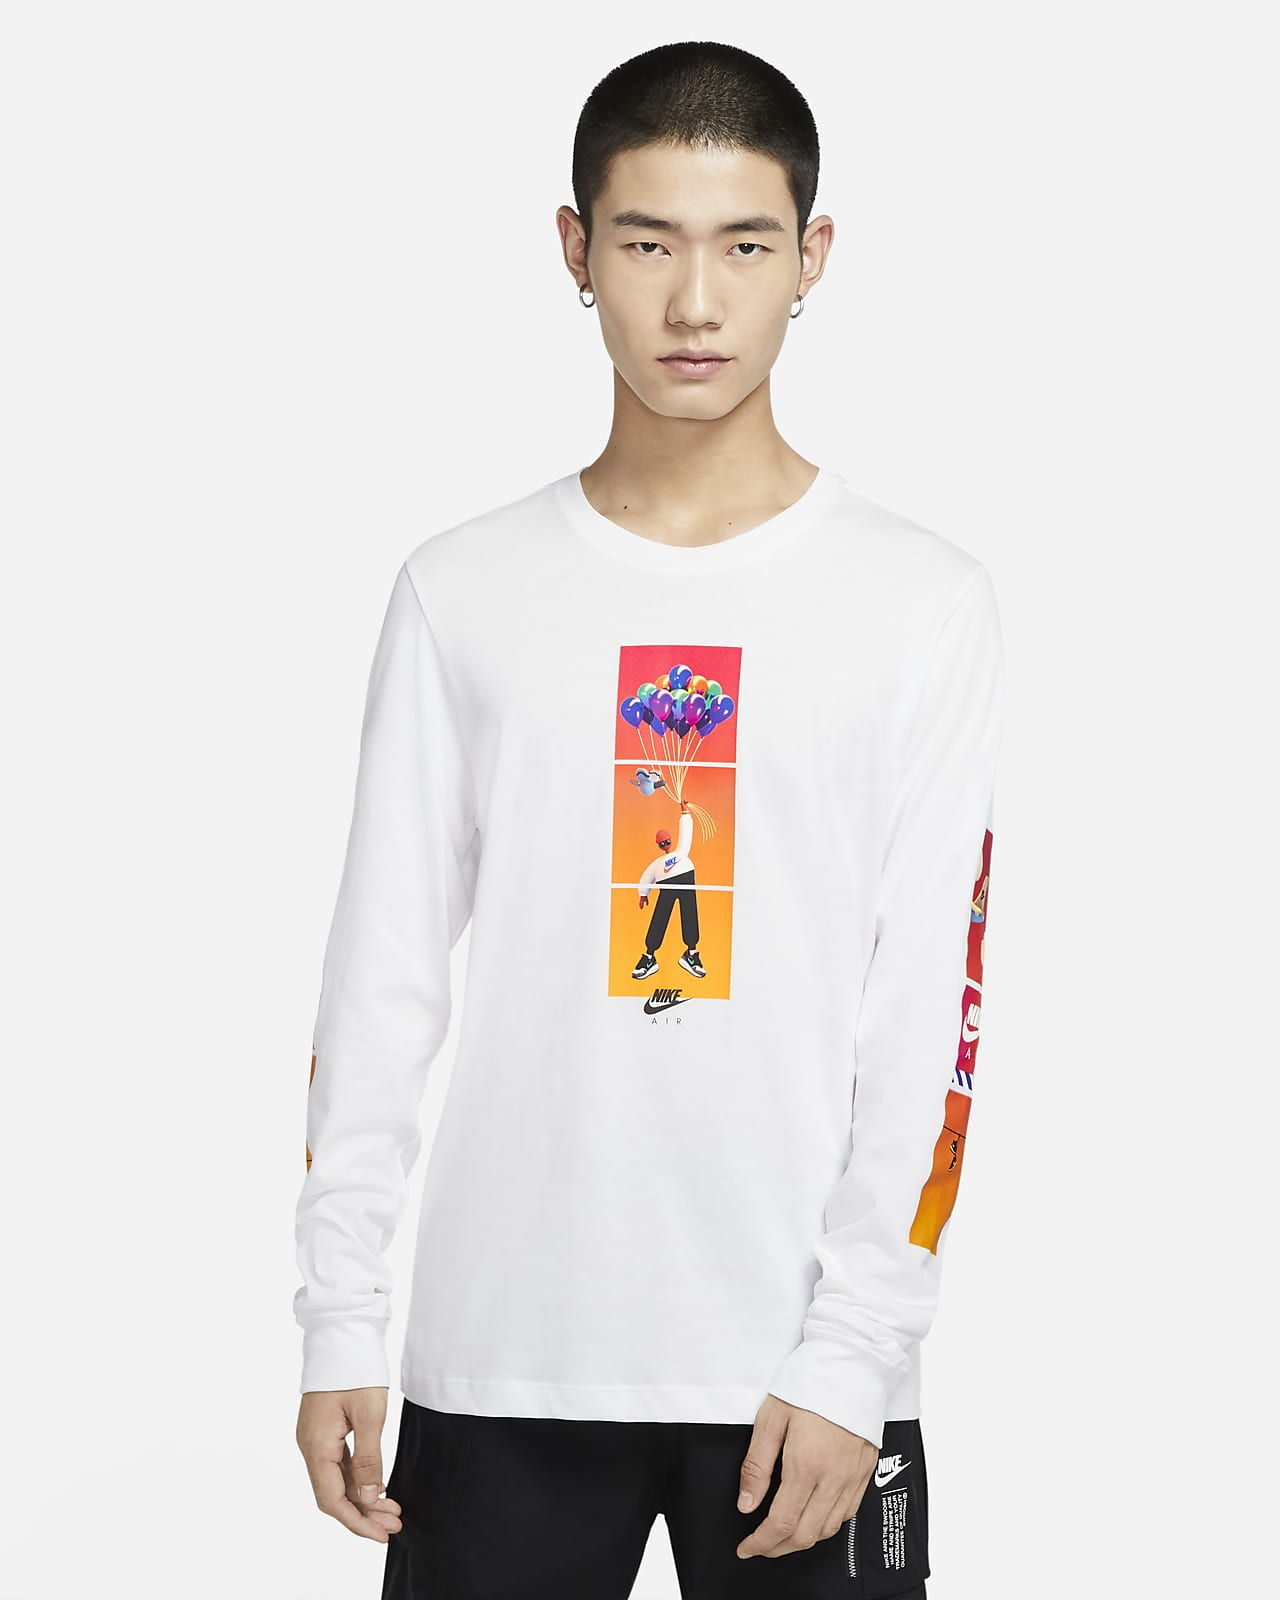 Nike Air Men's Long-Sleeve T-Shirt